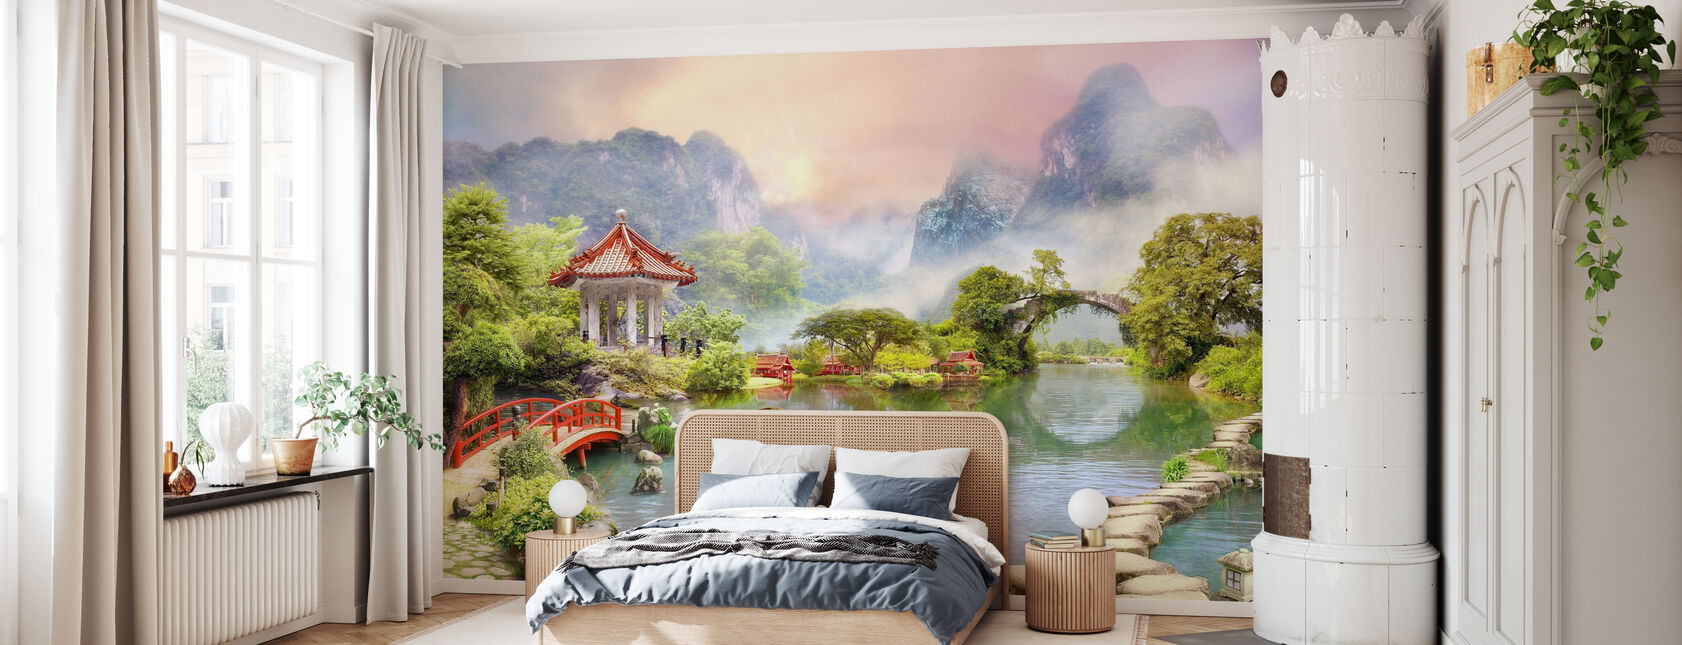 Tempel in Misty Mountains - Wallpaper - Bedroom